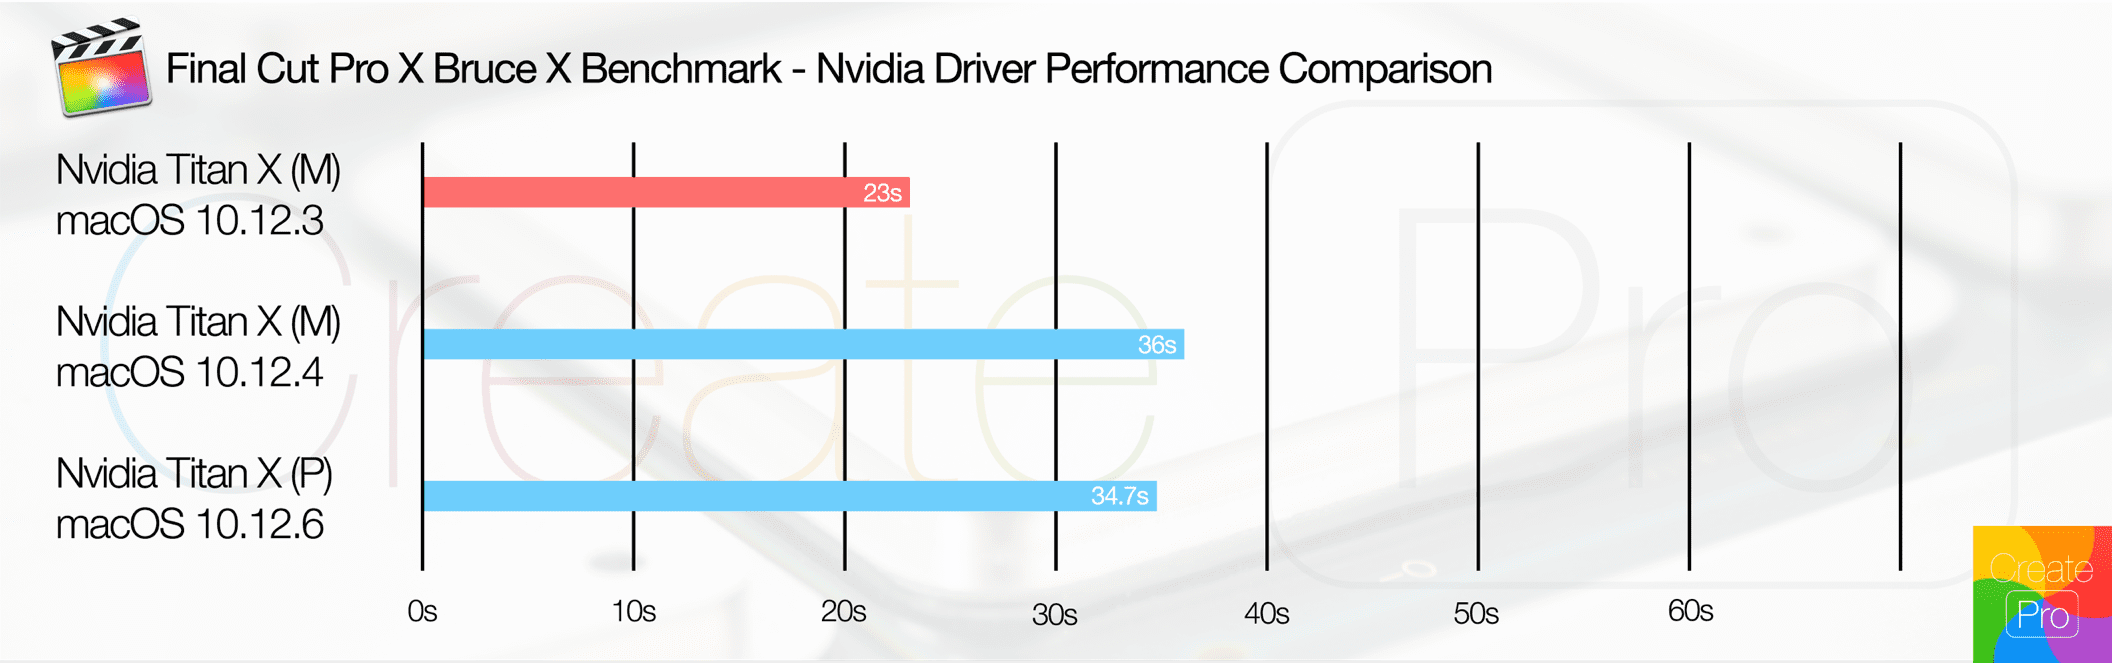 Final Cut Pro X Bruce X Performance Graph